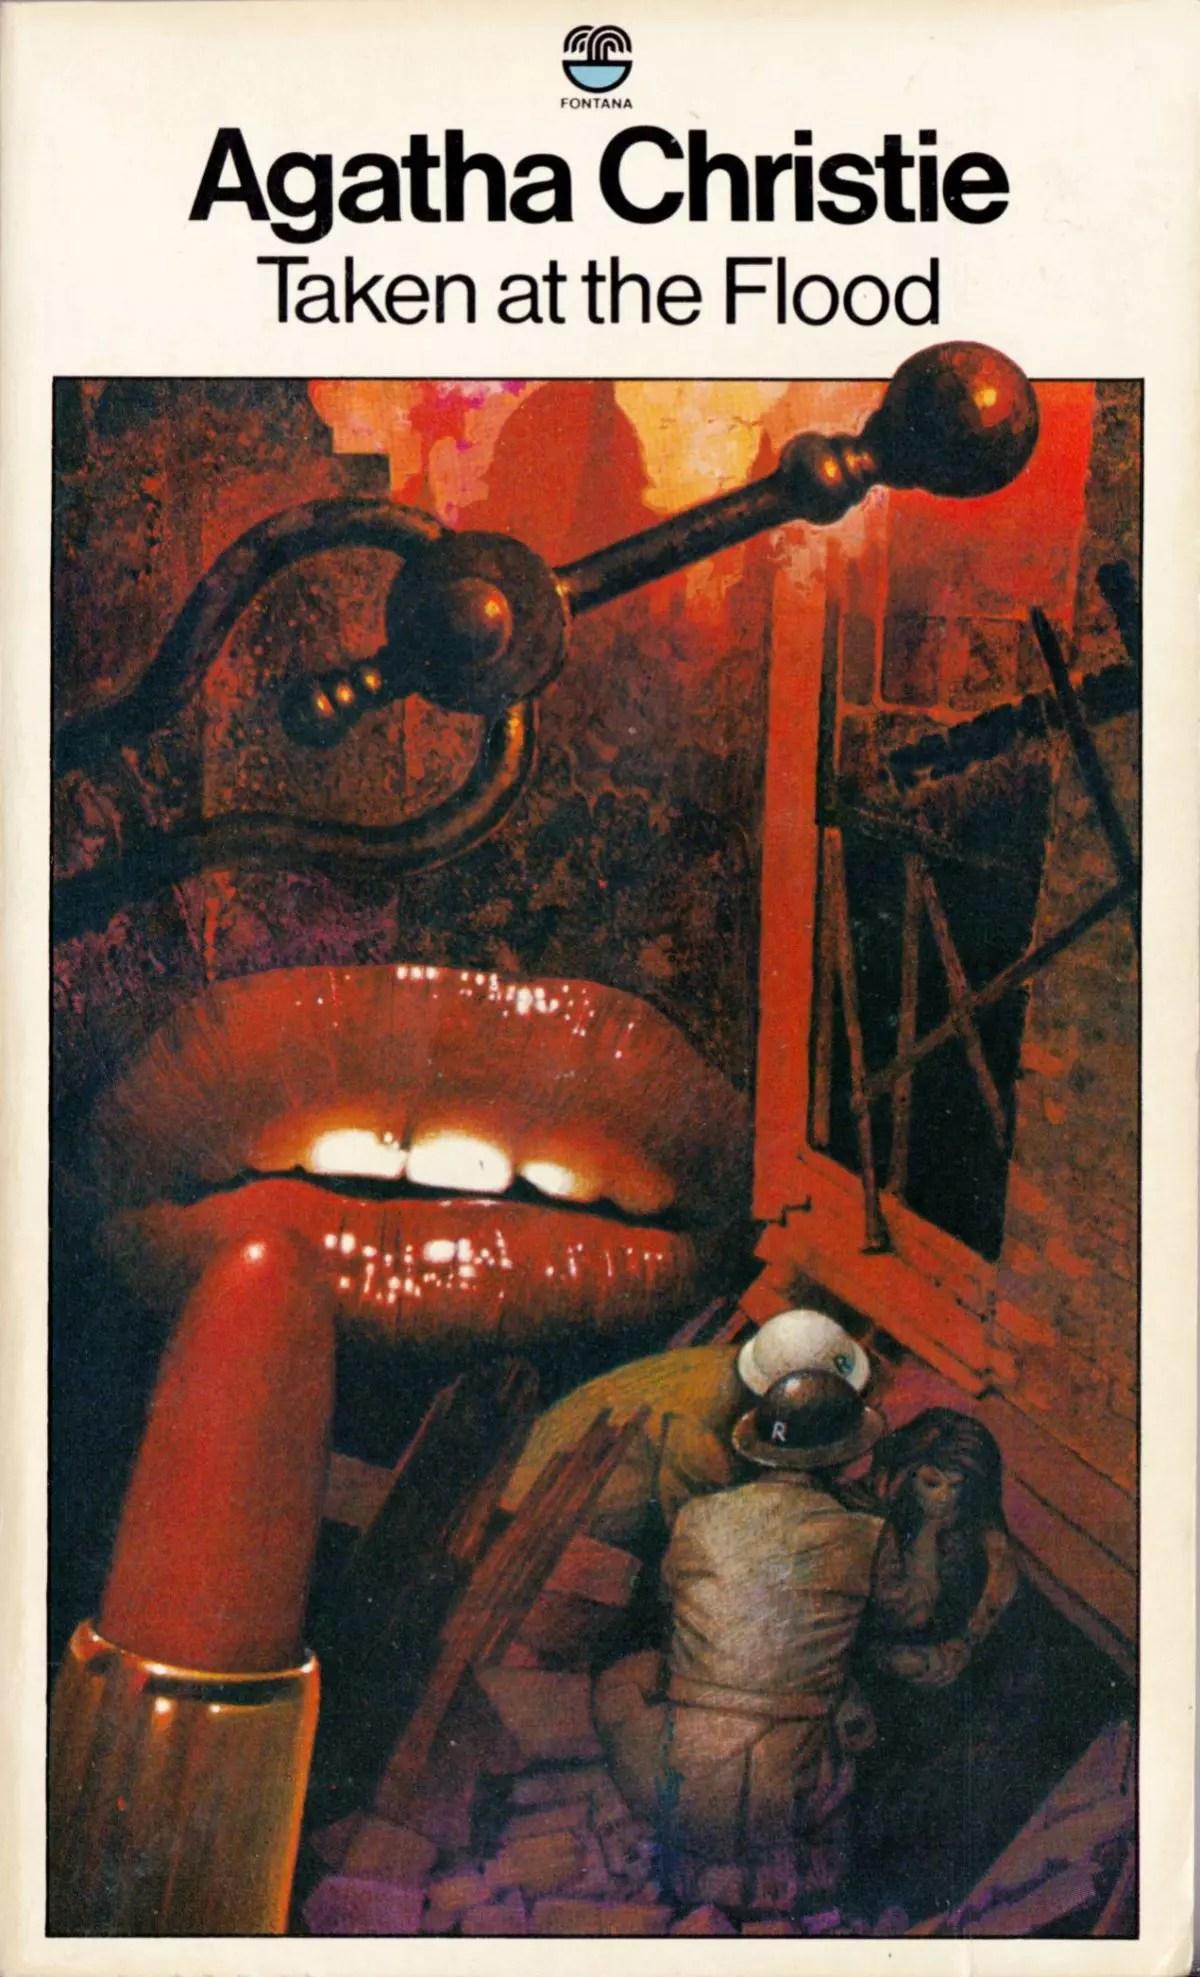 Agatha Christie Tom Adams Taken at the FLood Fontana 1979